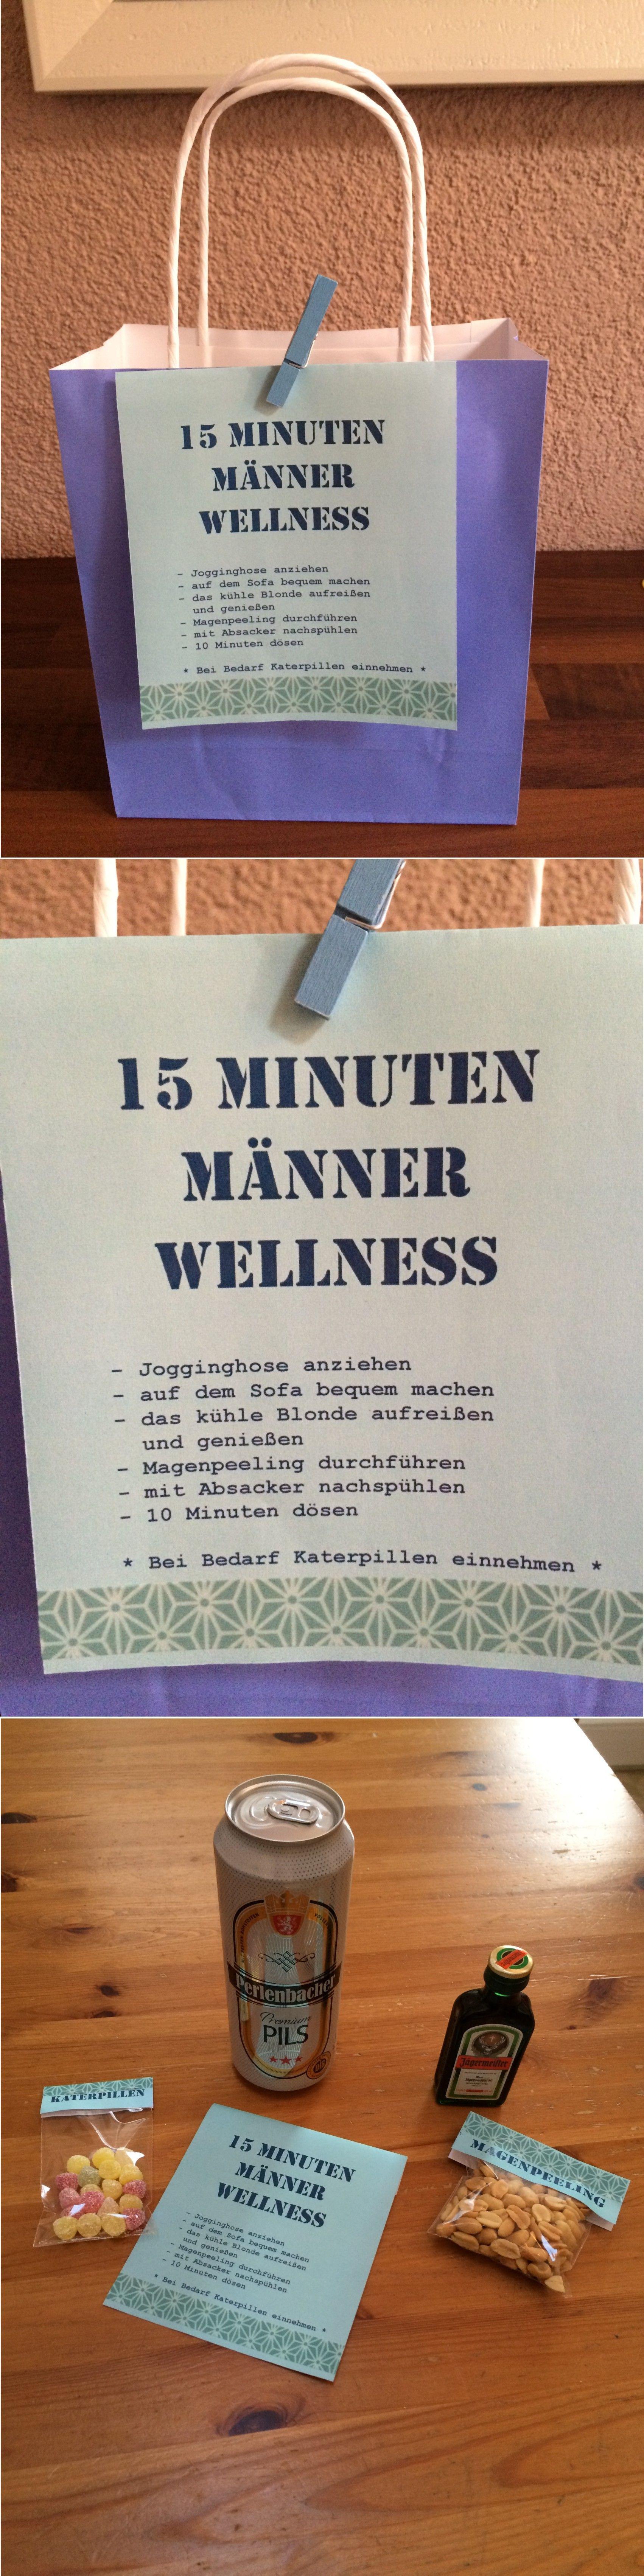 Geschenkideen Für Partner  15 Minuten Männer Wellness Geschenkidee für den Mann